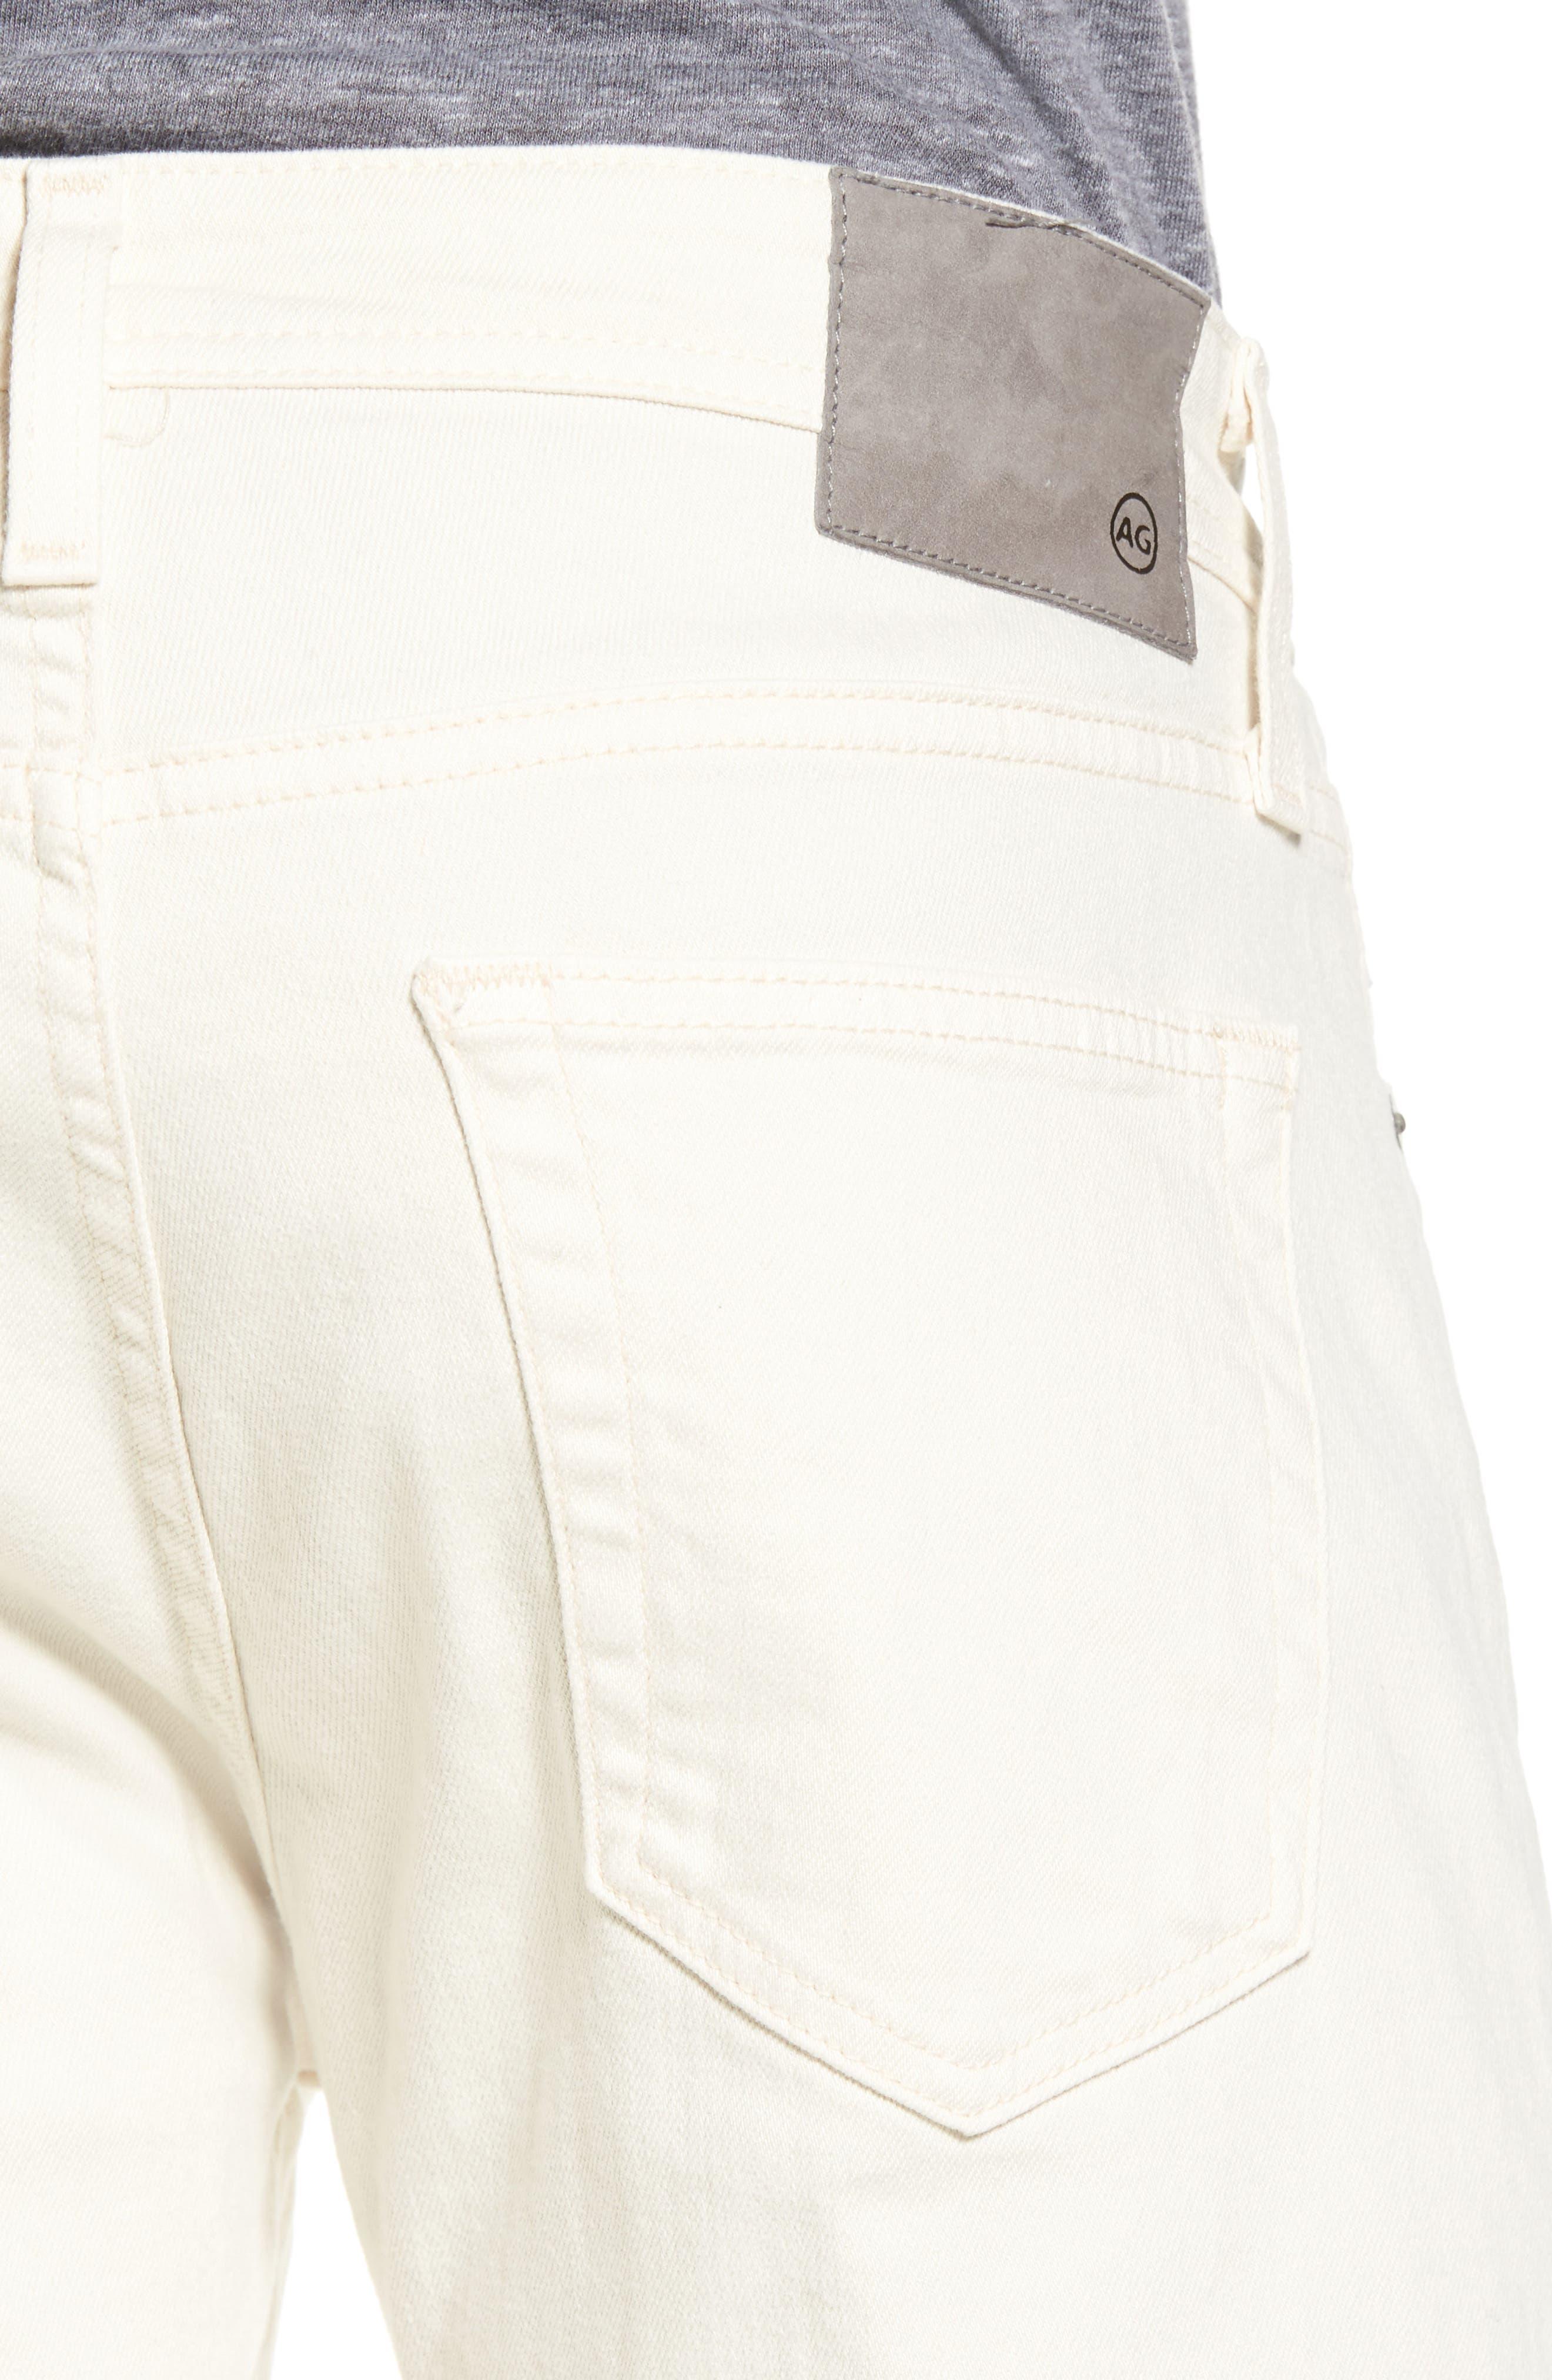 Tellis Modern Slim Twill Pants,                             Alternate thumbnail 4, color,                             020